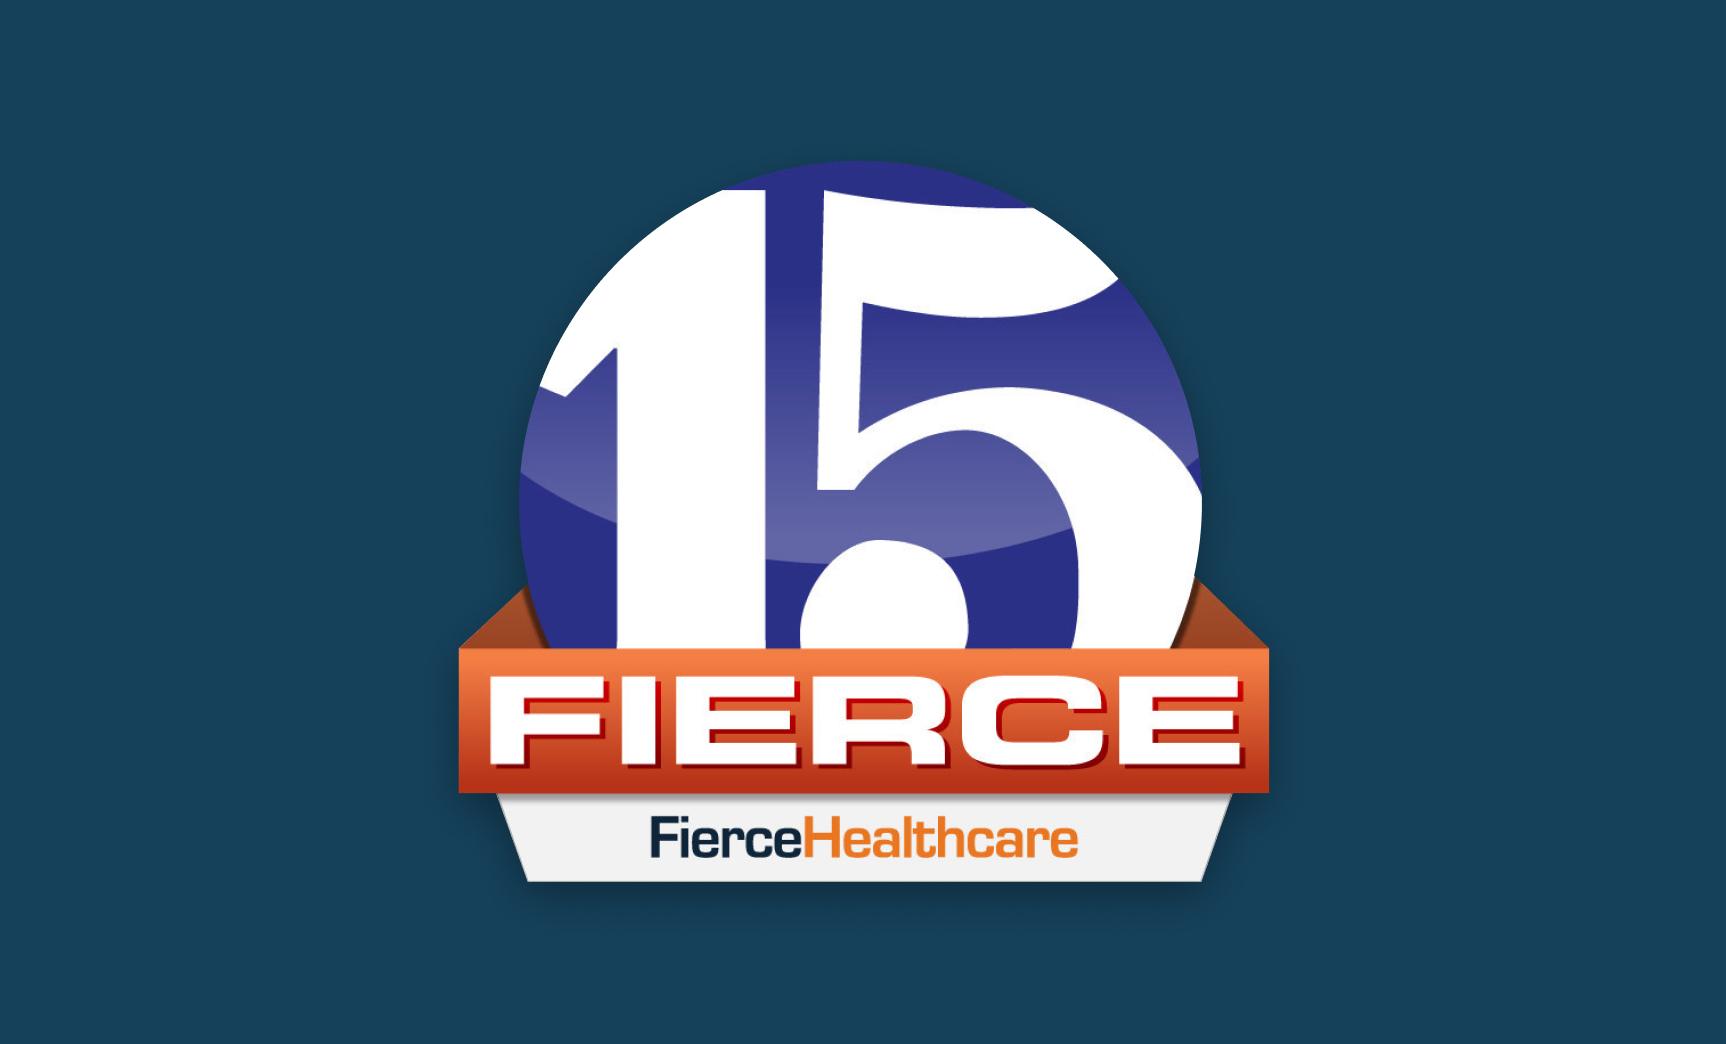 Carrot named to Fierce Healthcare's Fierce 15